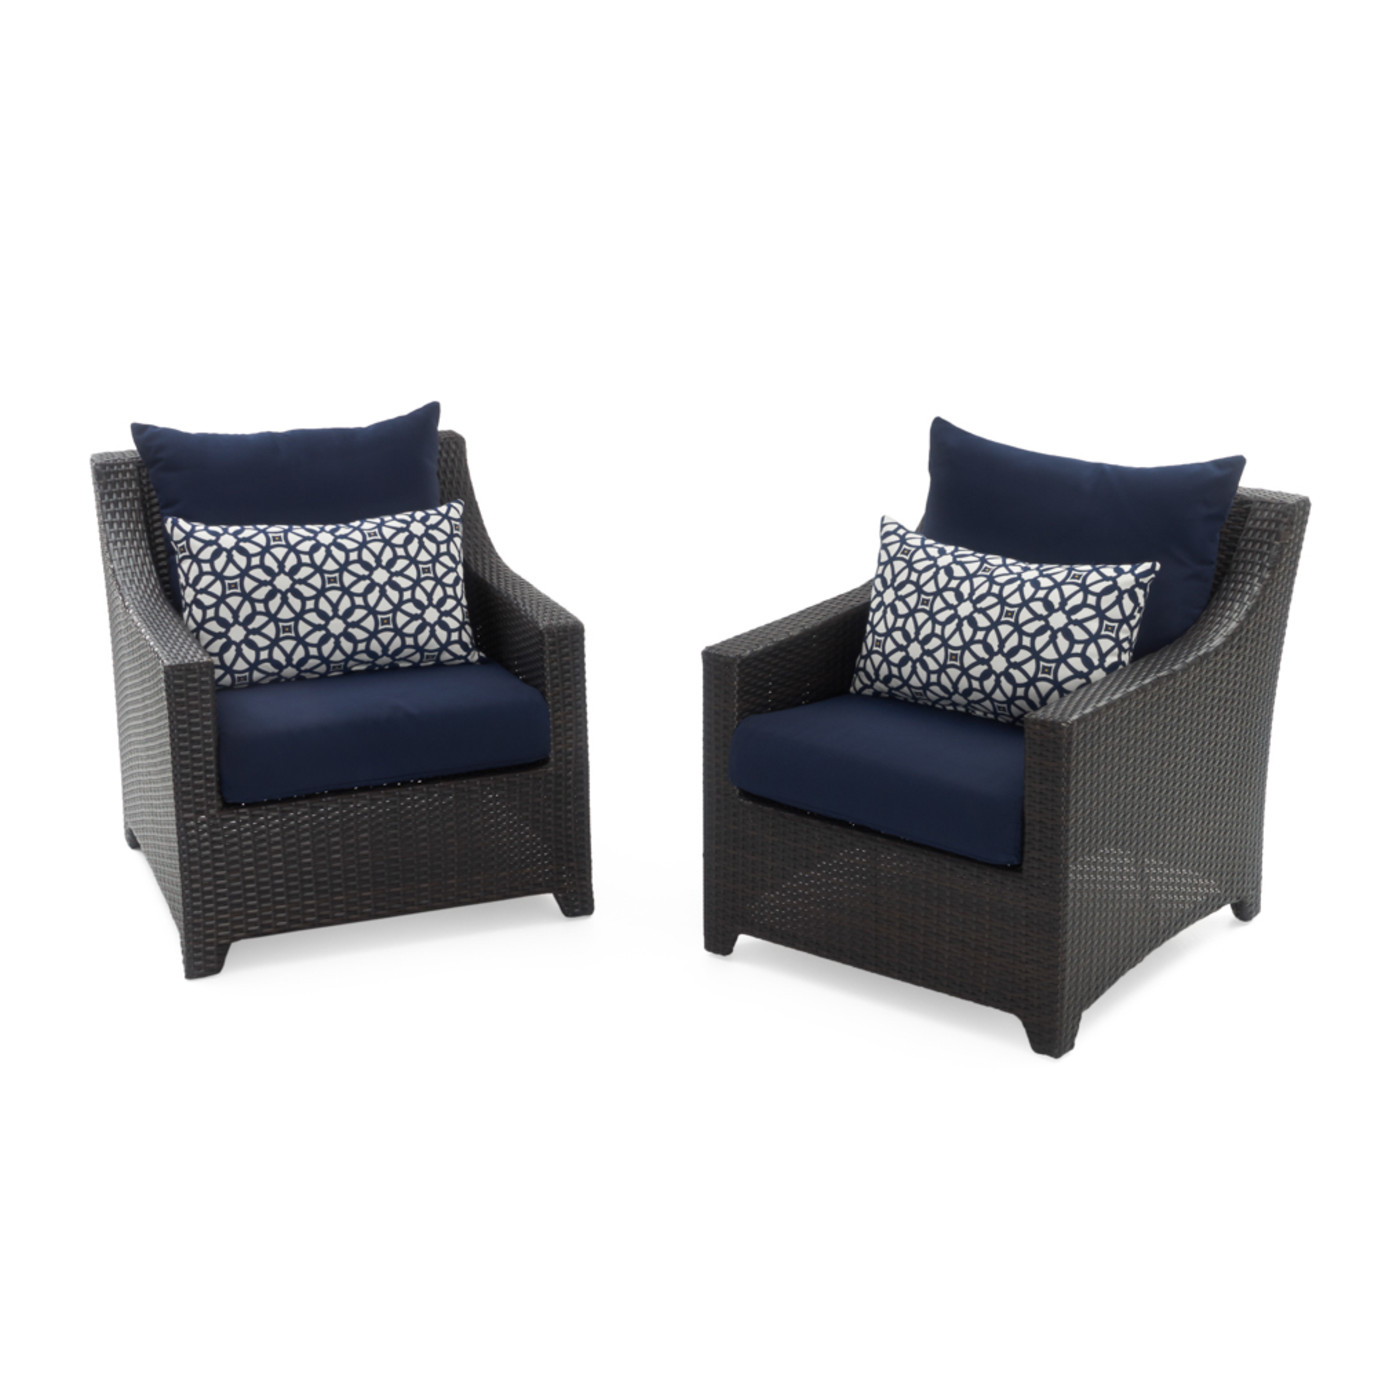 Deco™ Club Chairs